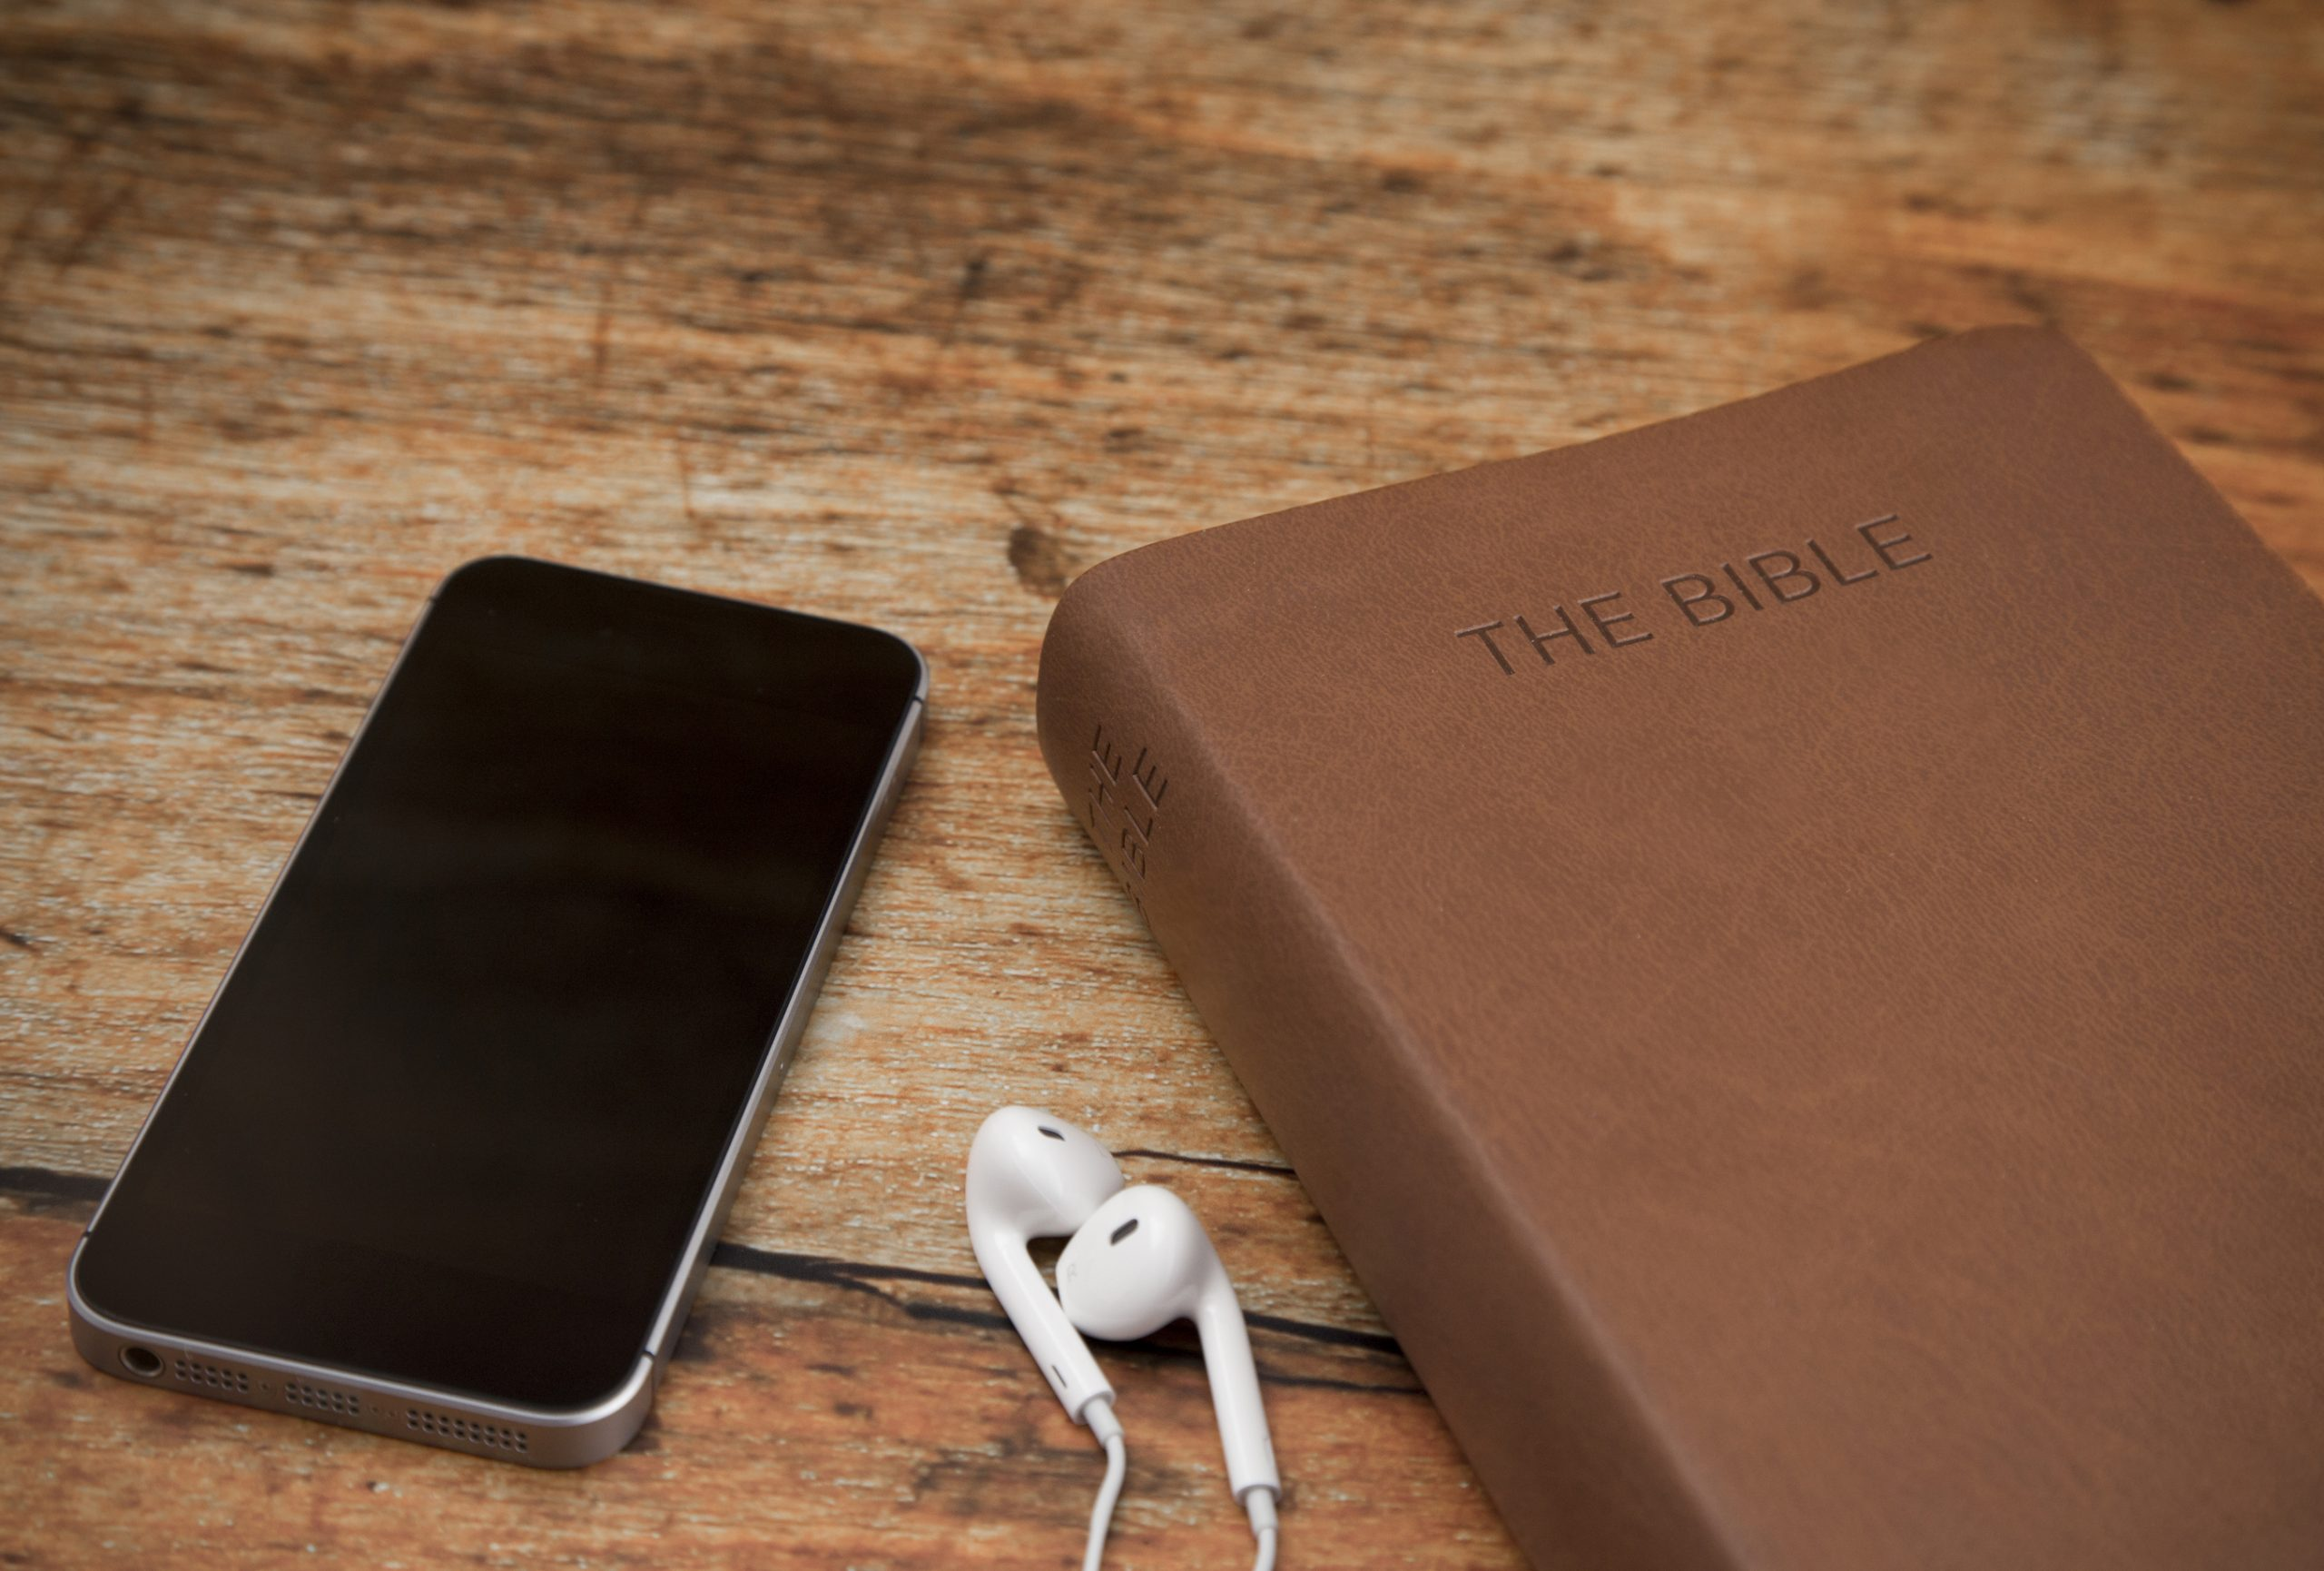 Bible and phone - earplugs